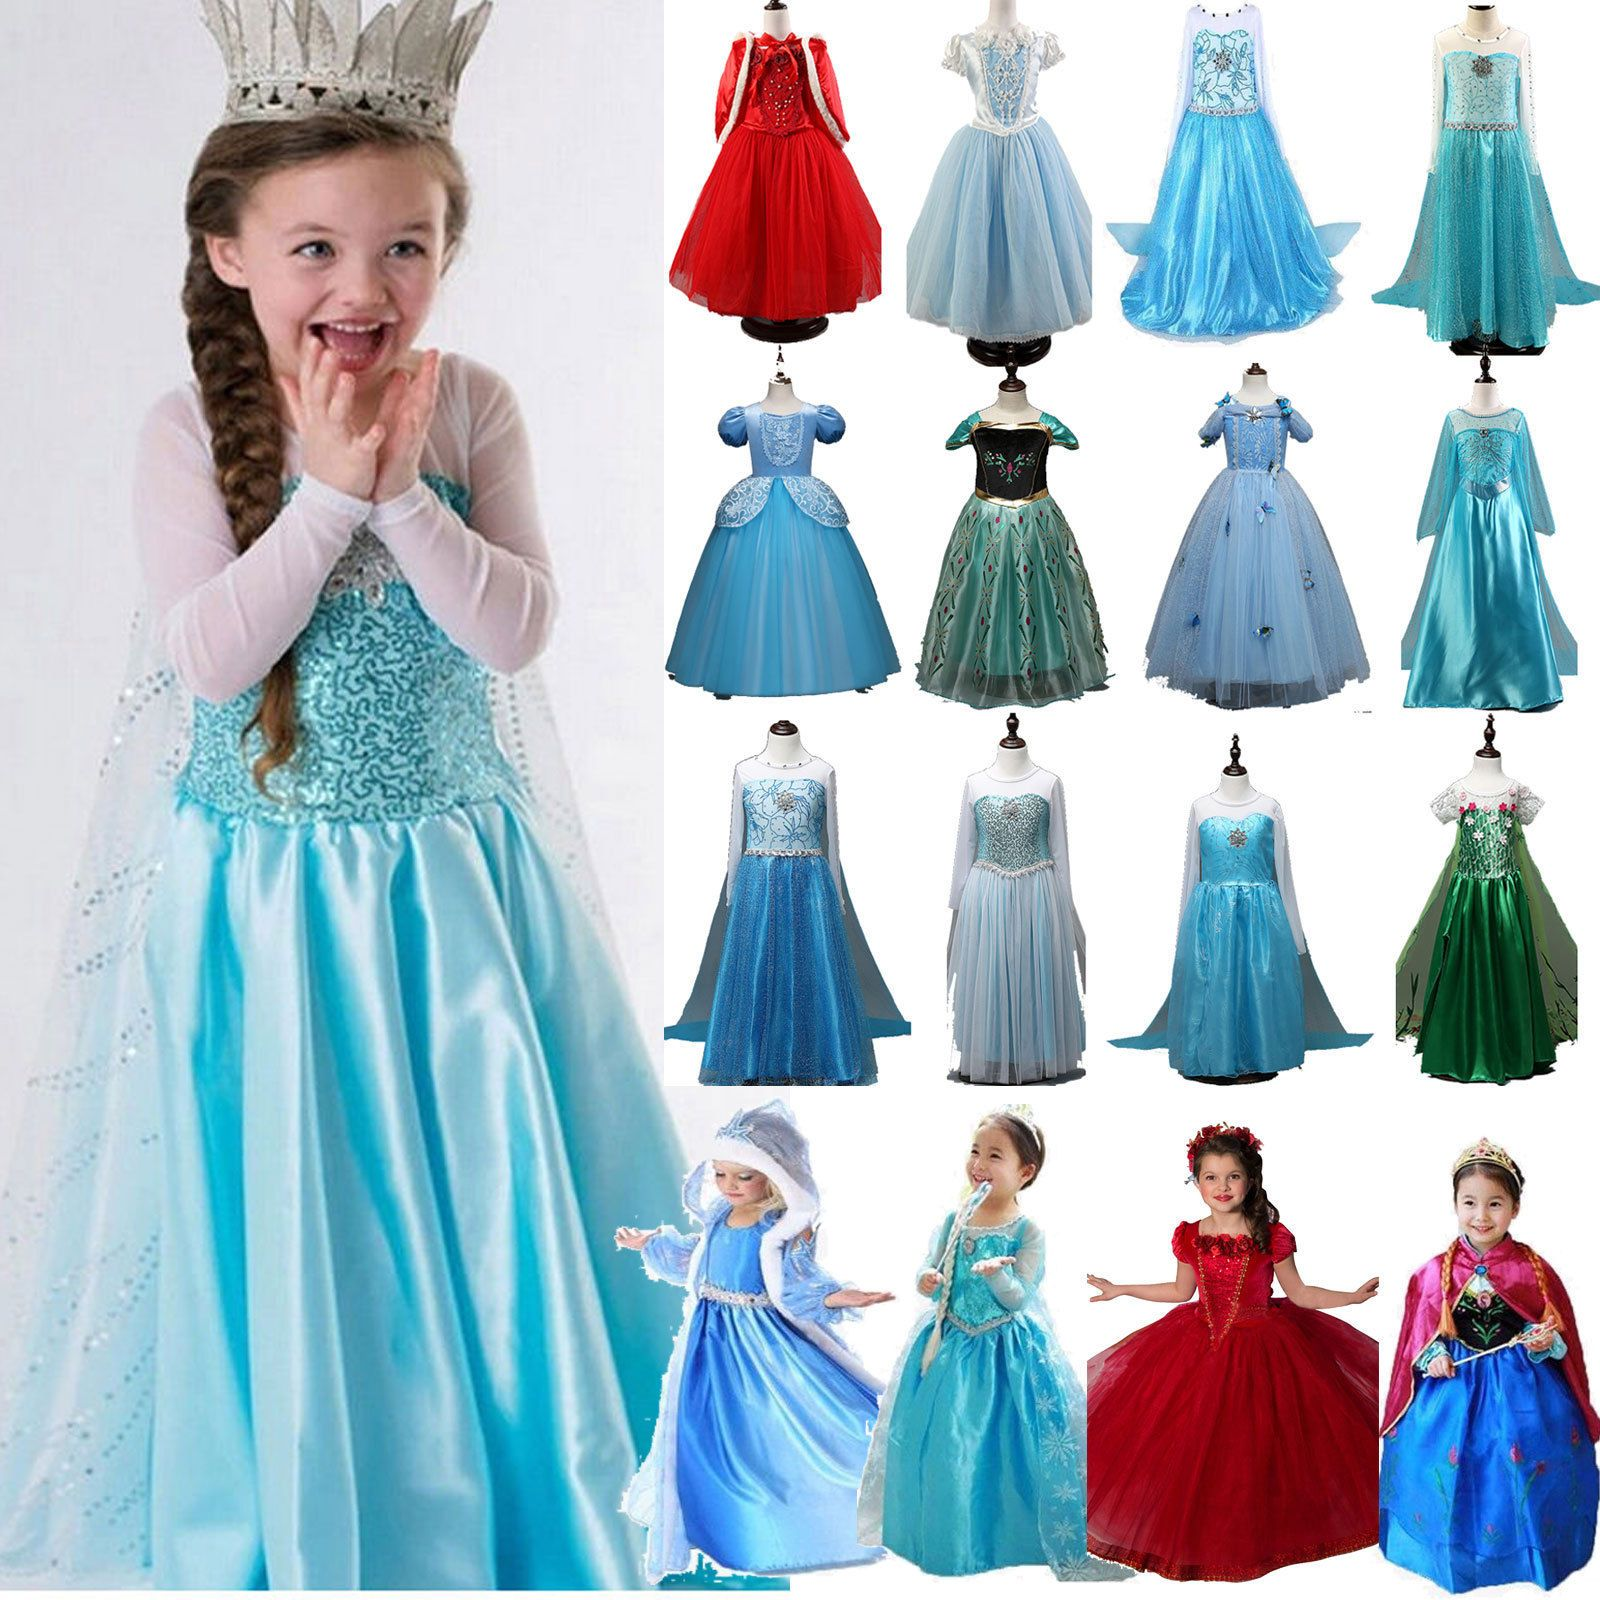 Kids Girls Party Costume Princess Fairytale Dress Up Elsa Fancy Tulle Tutu Dress